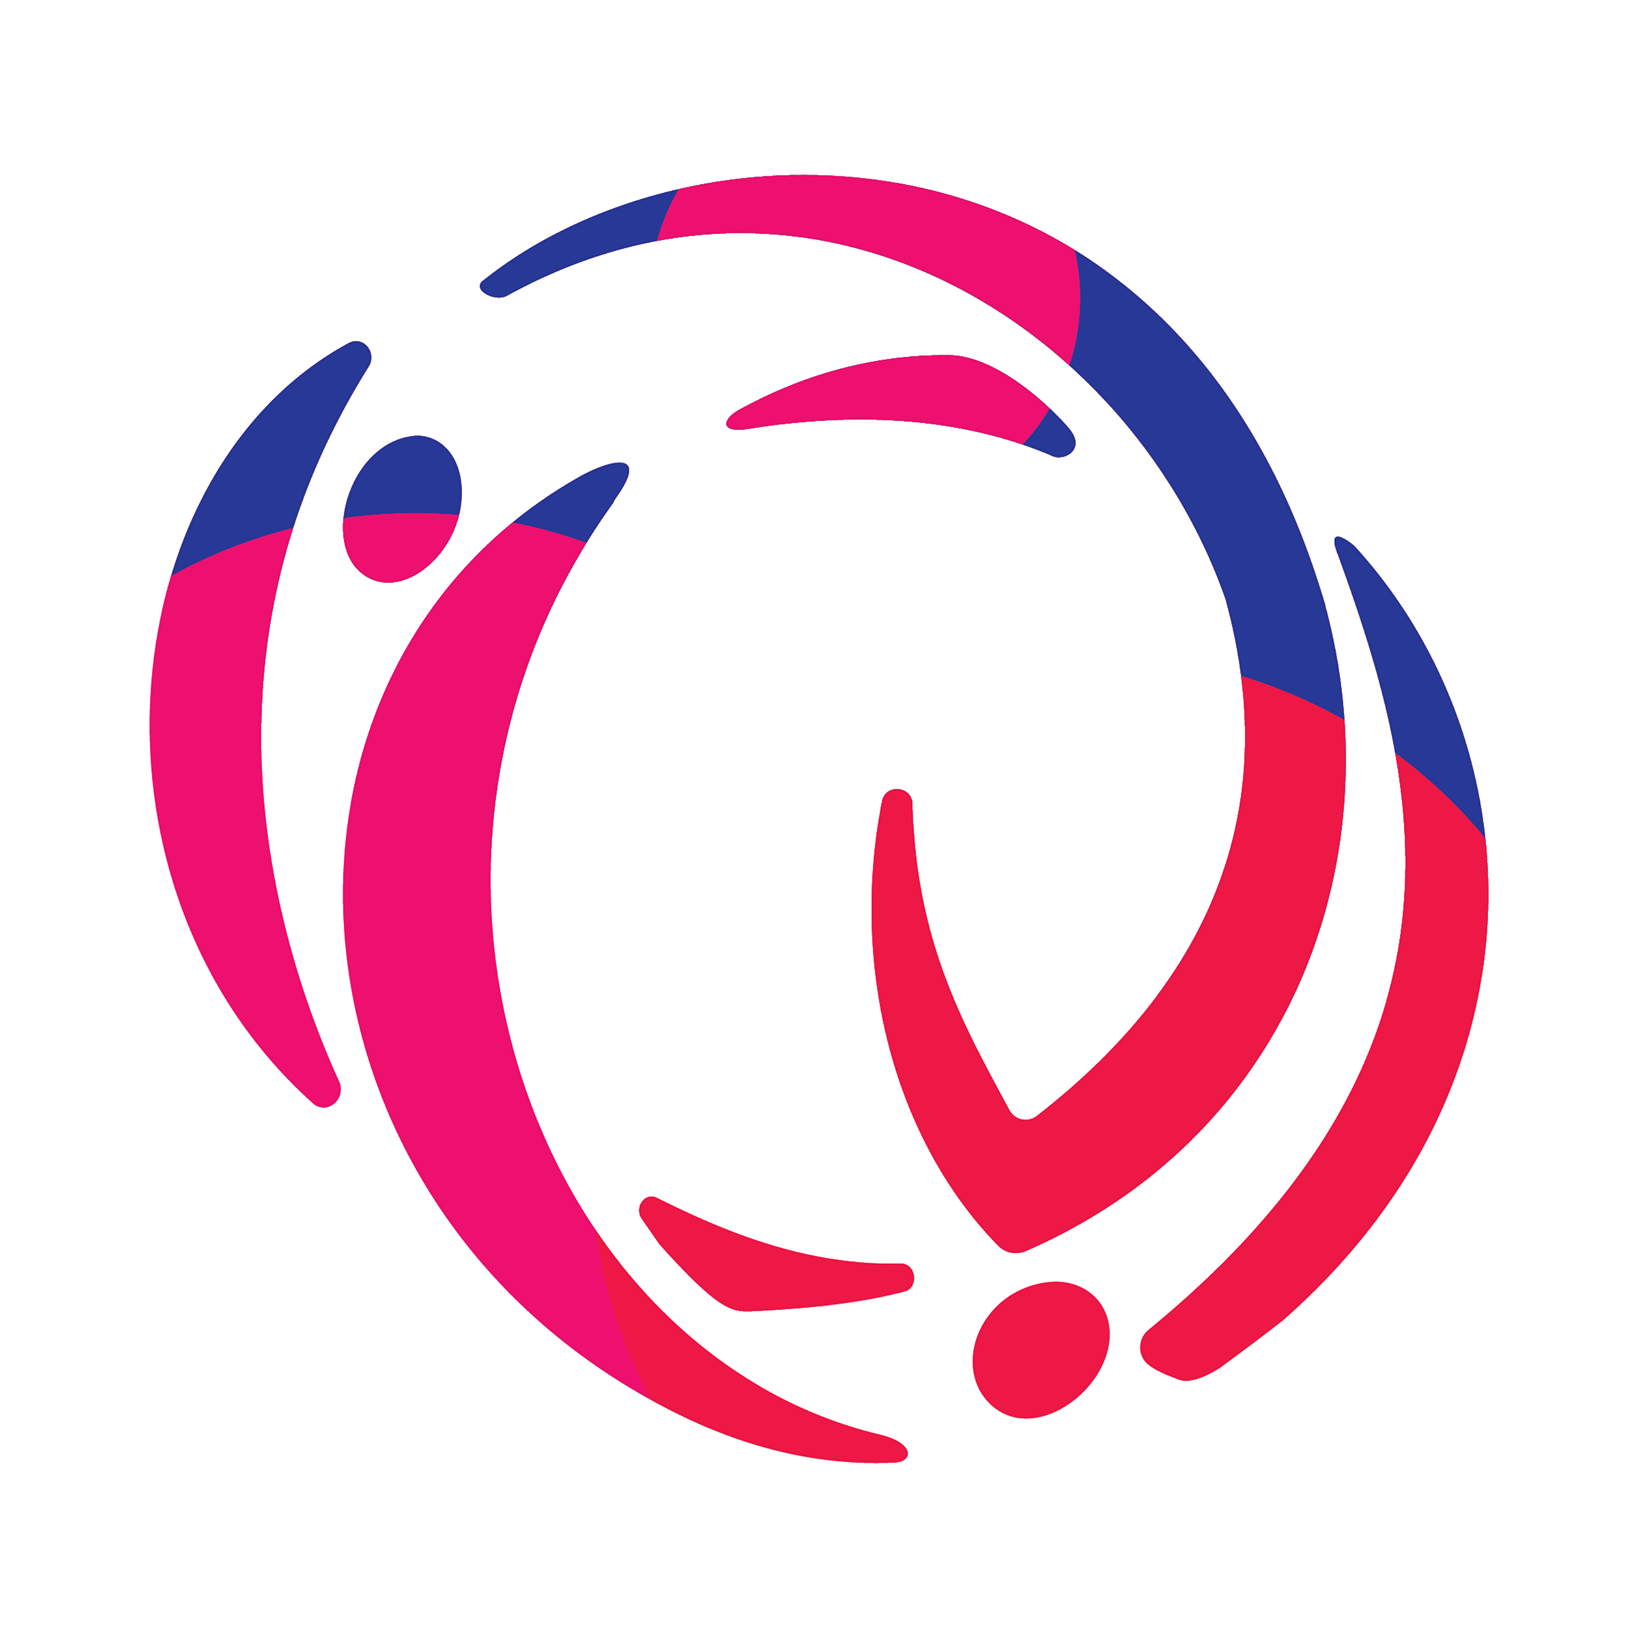 2014 European Artistic Gymnastics Championships - Men